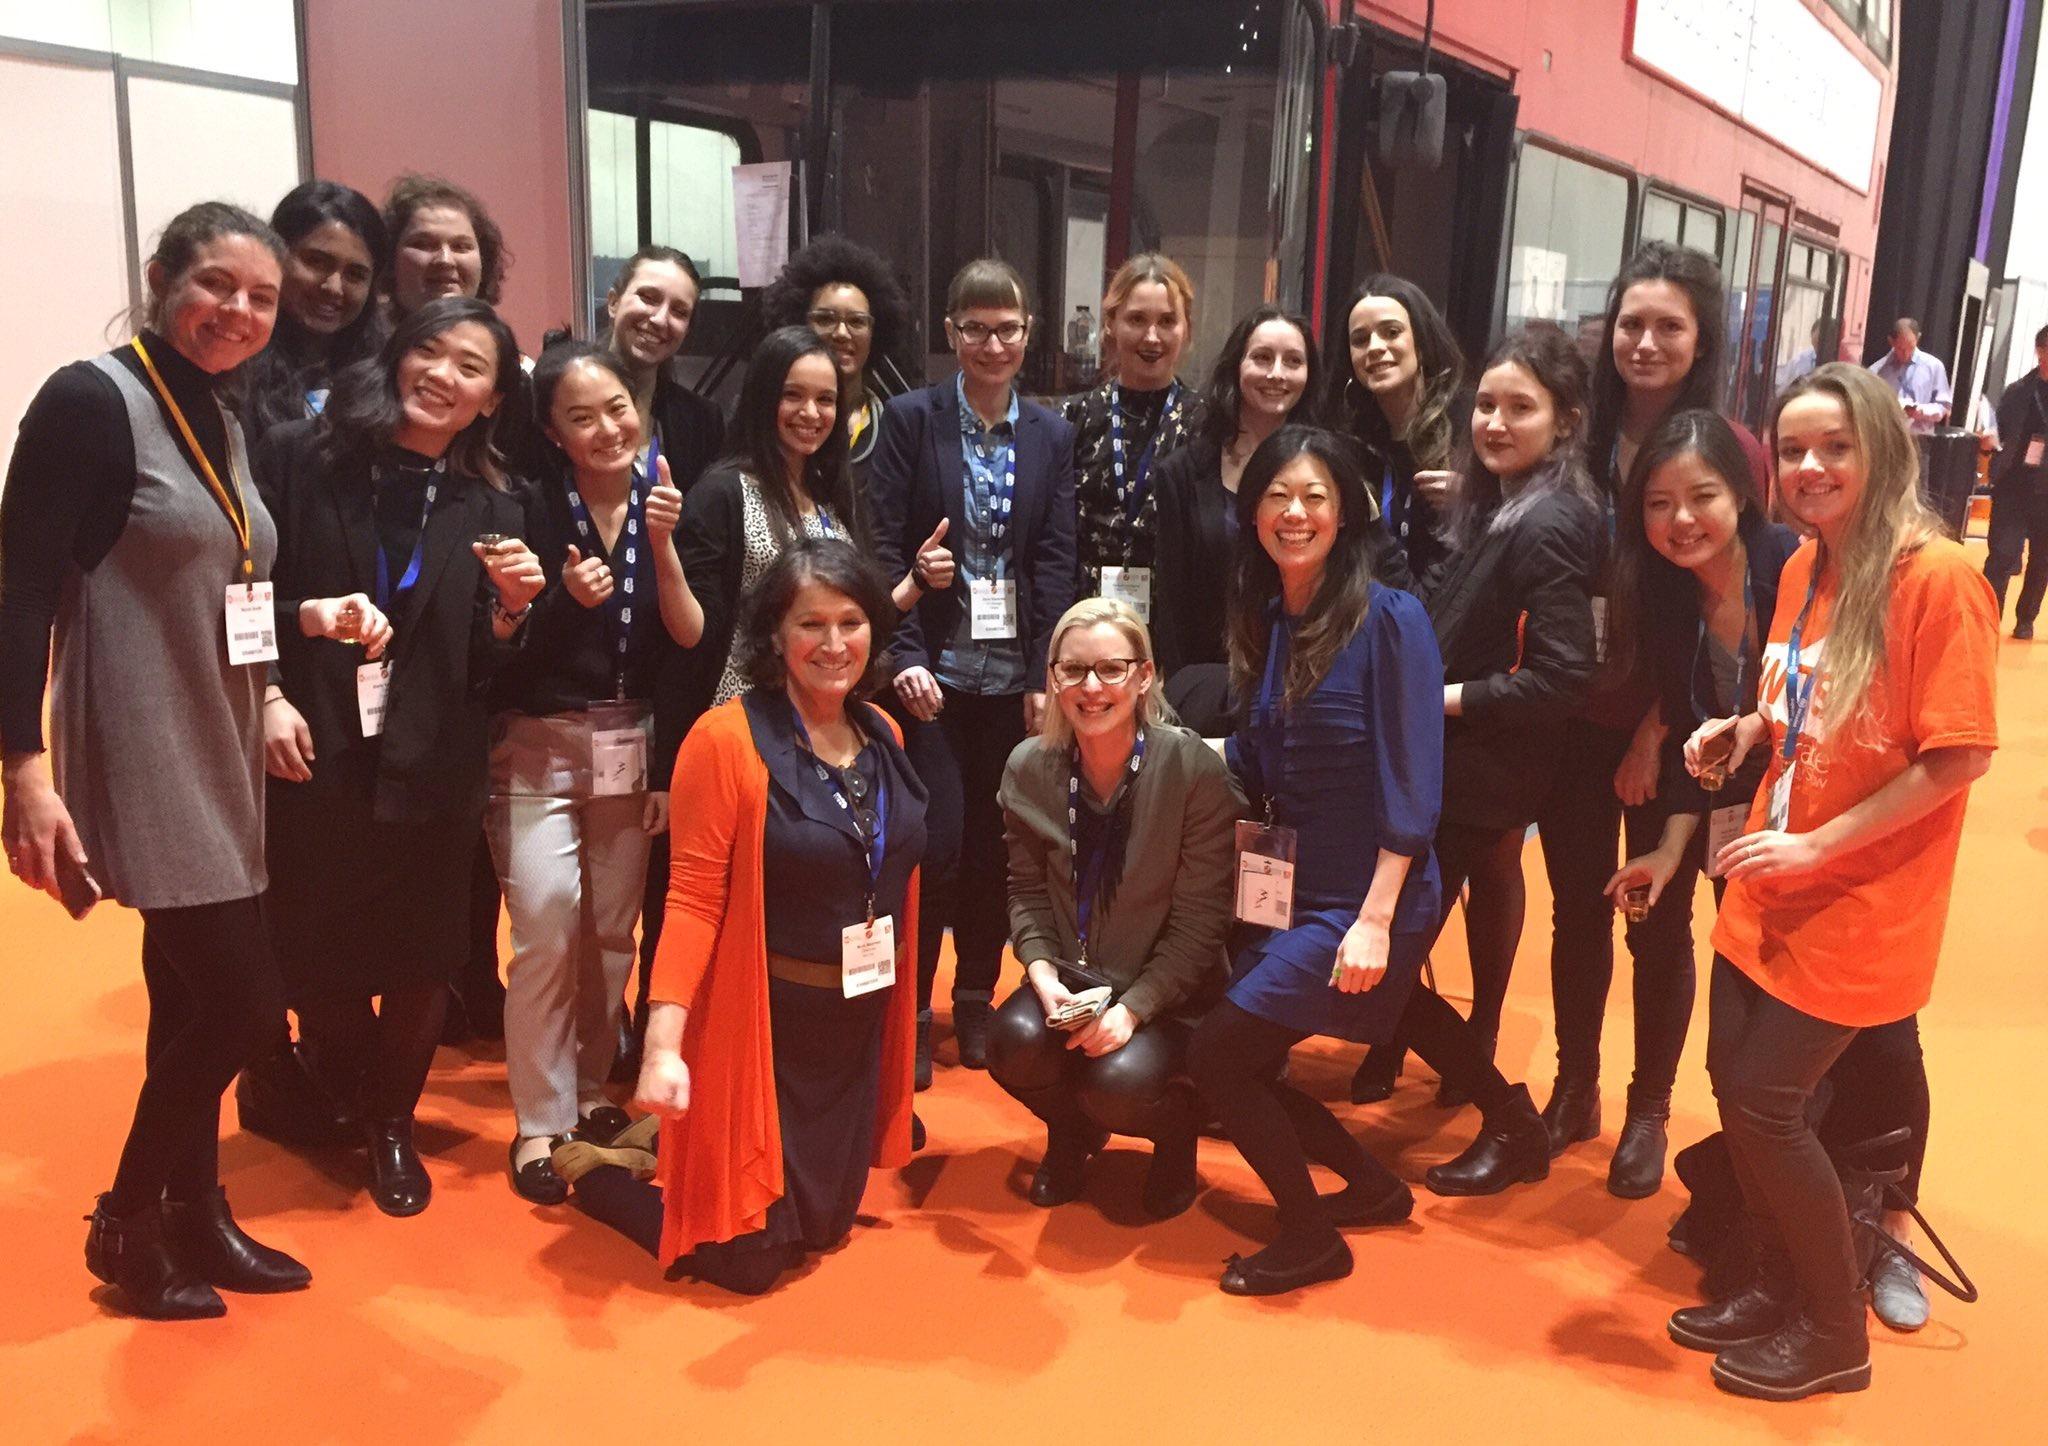 WoW women at Wearable Tech Show 2017